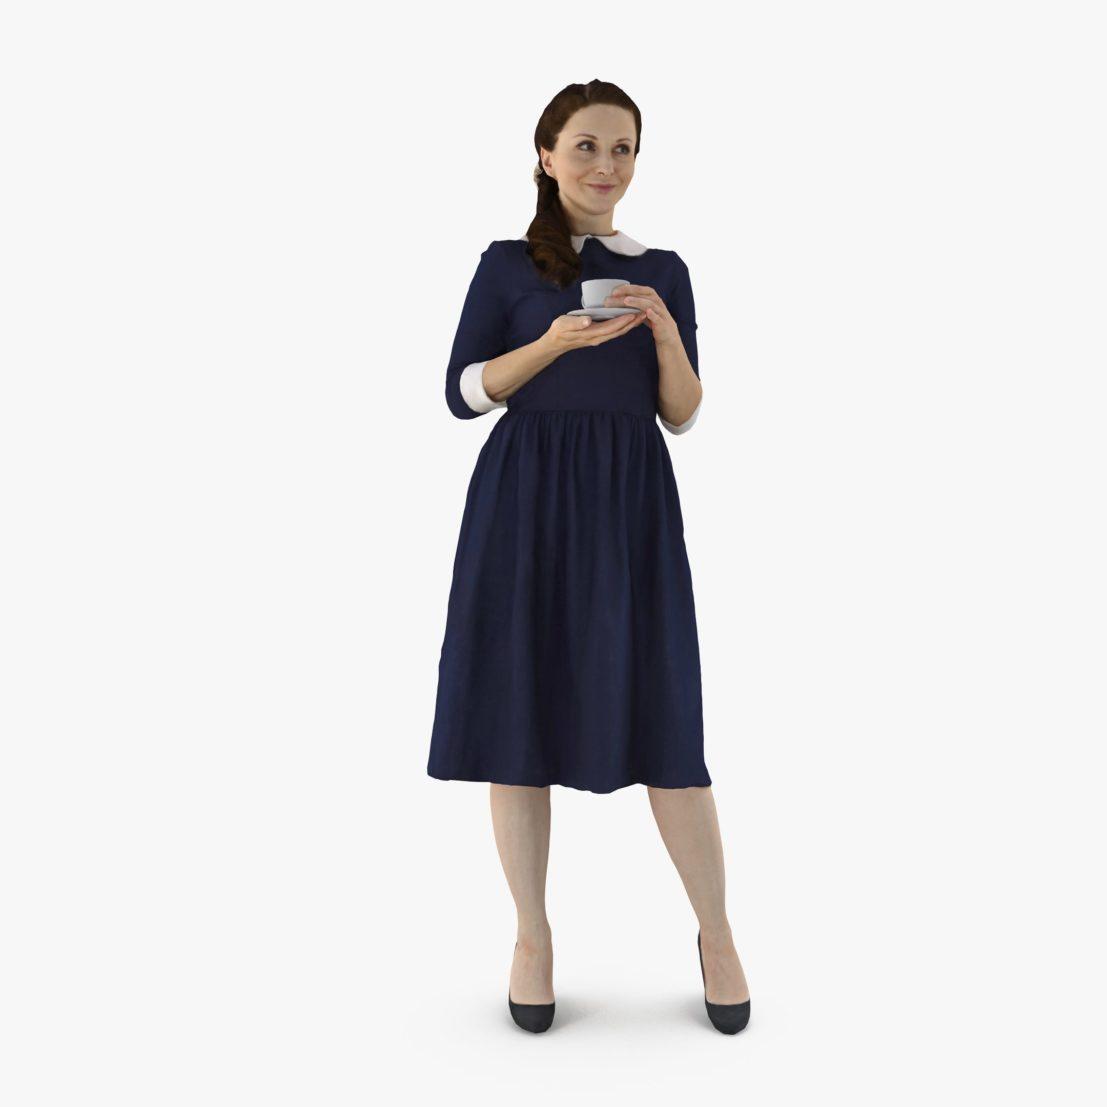 Lady Drinking Tea 3D Model | 3DTree Scanning Studio